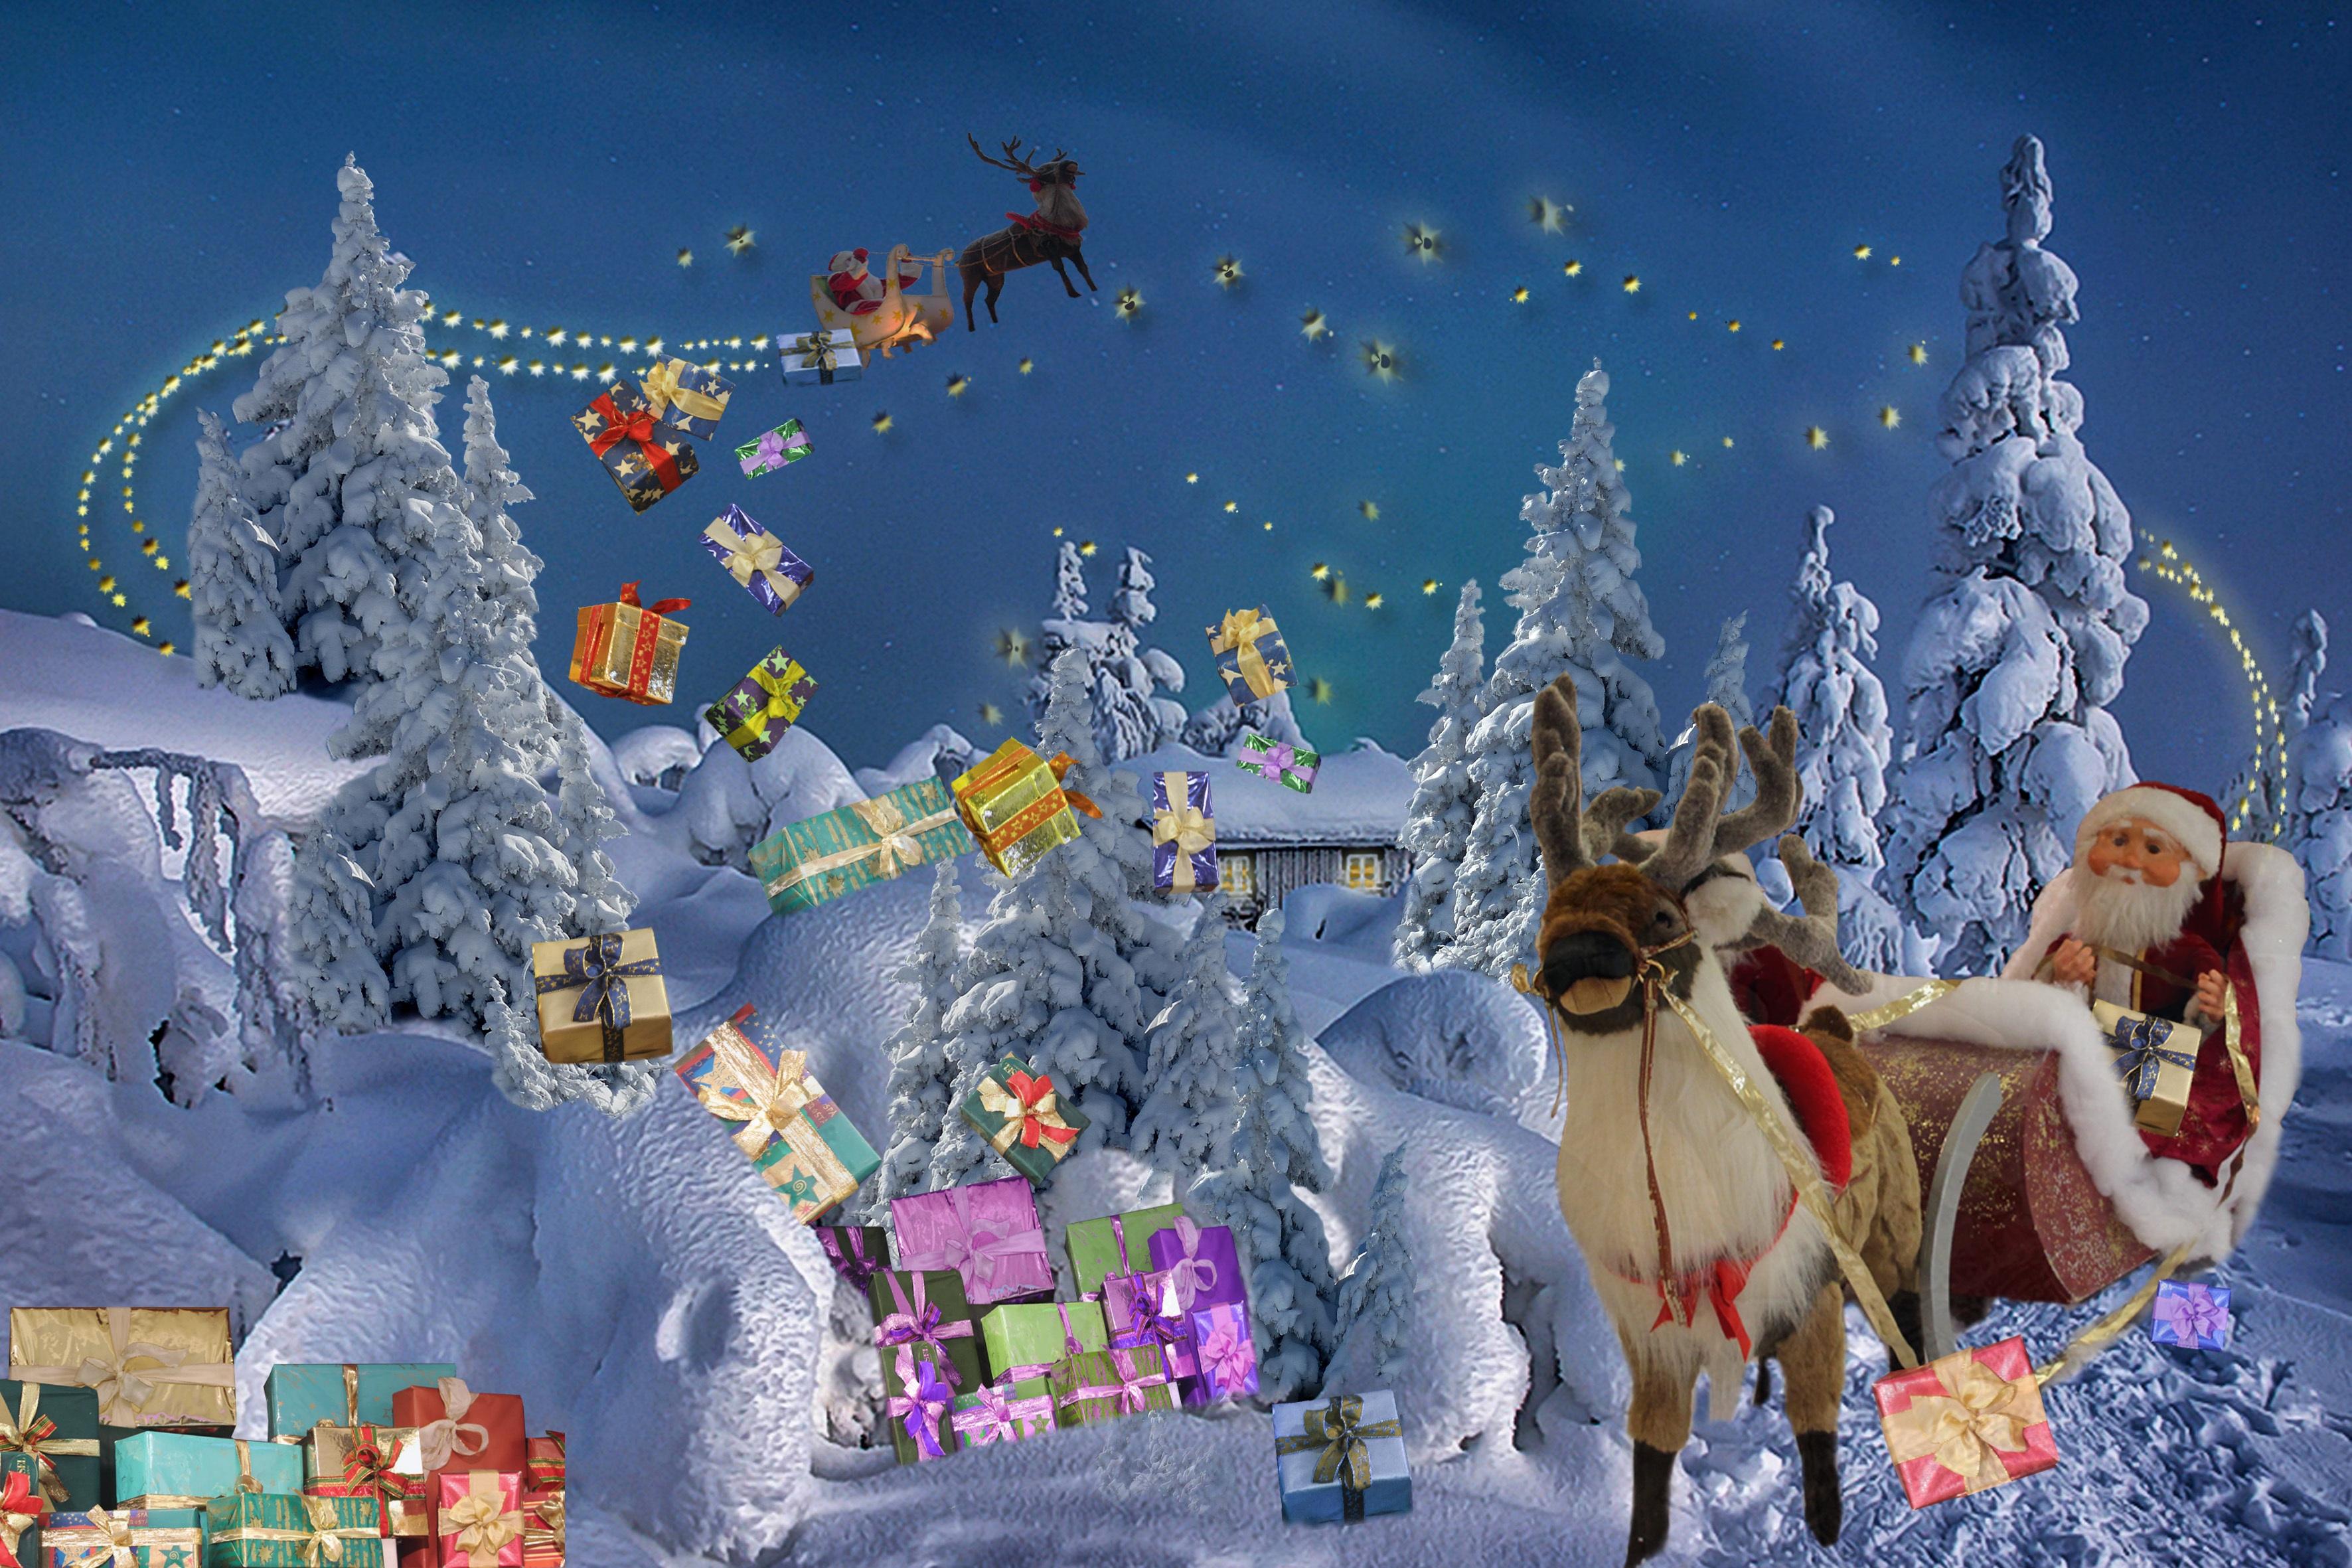 Christmas Season, Christmas, Claus, Frozen, Ice, HQ Photo